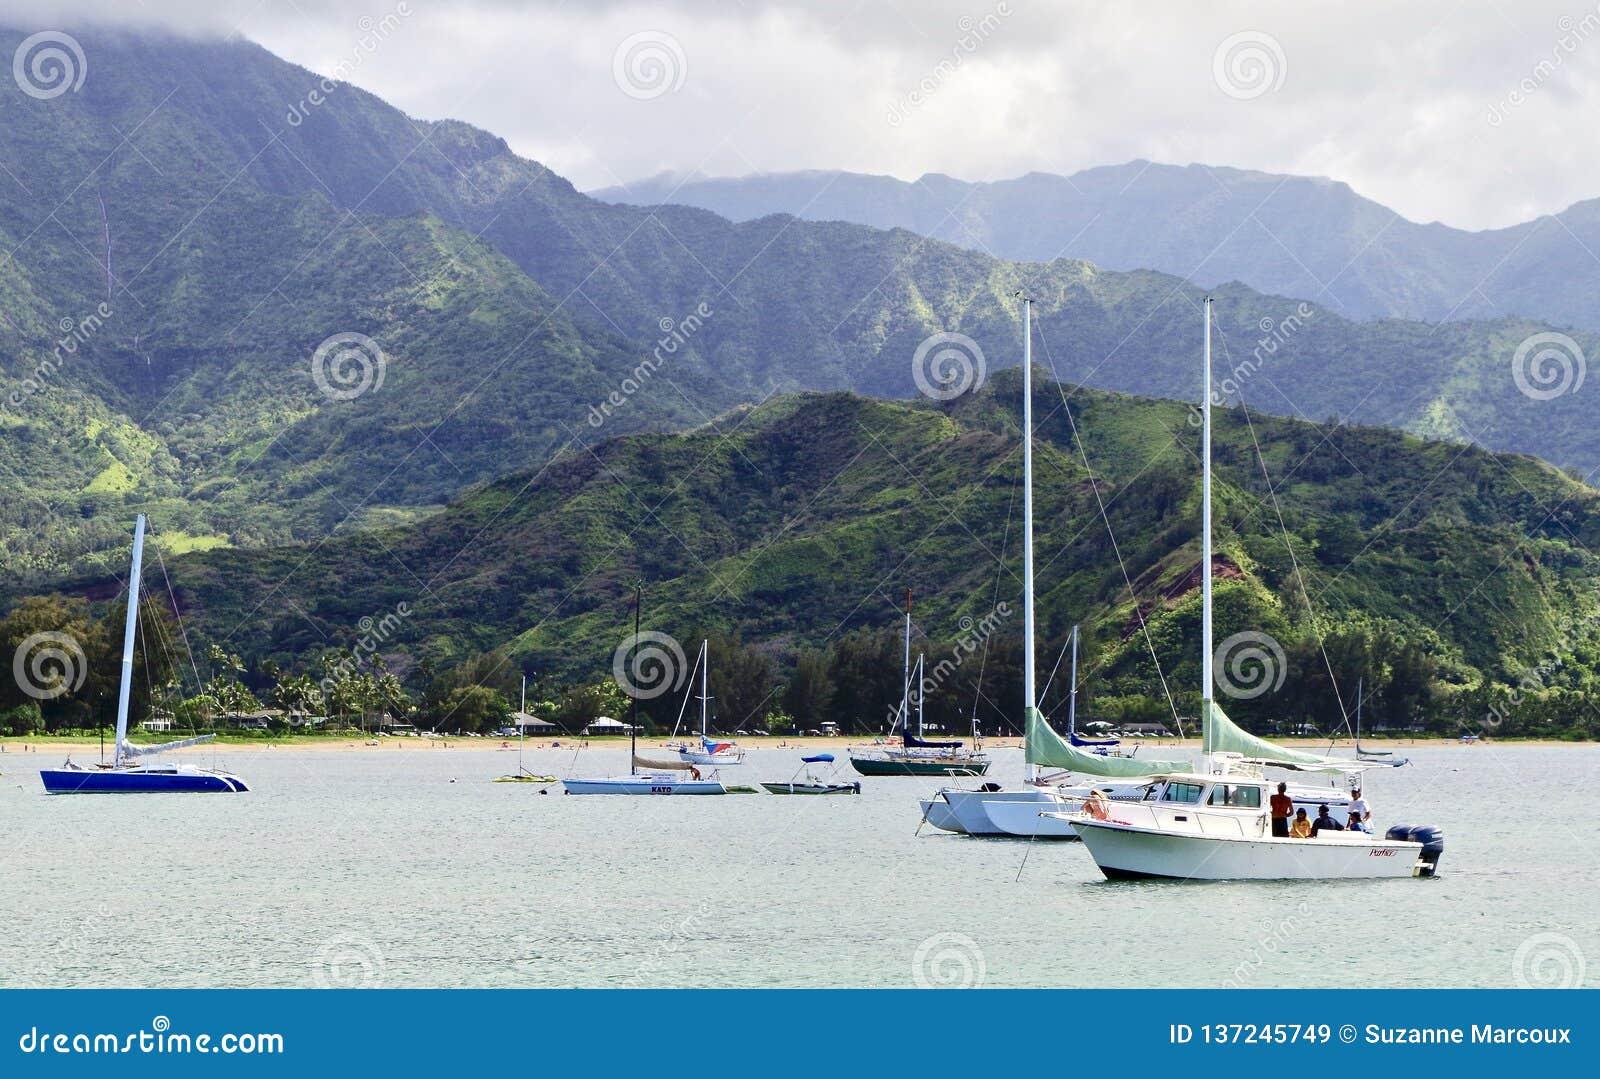 Hanaleibaai, Kauai, Hawaï, de V.S.